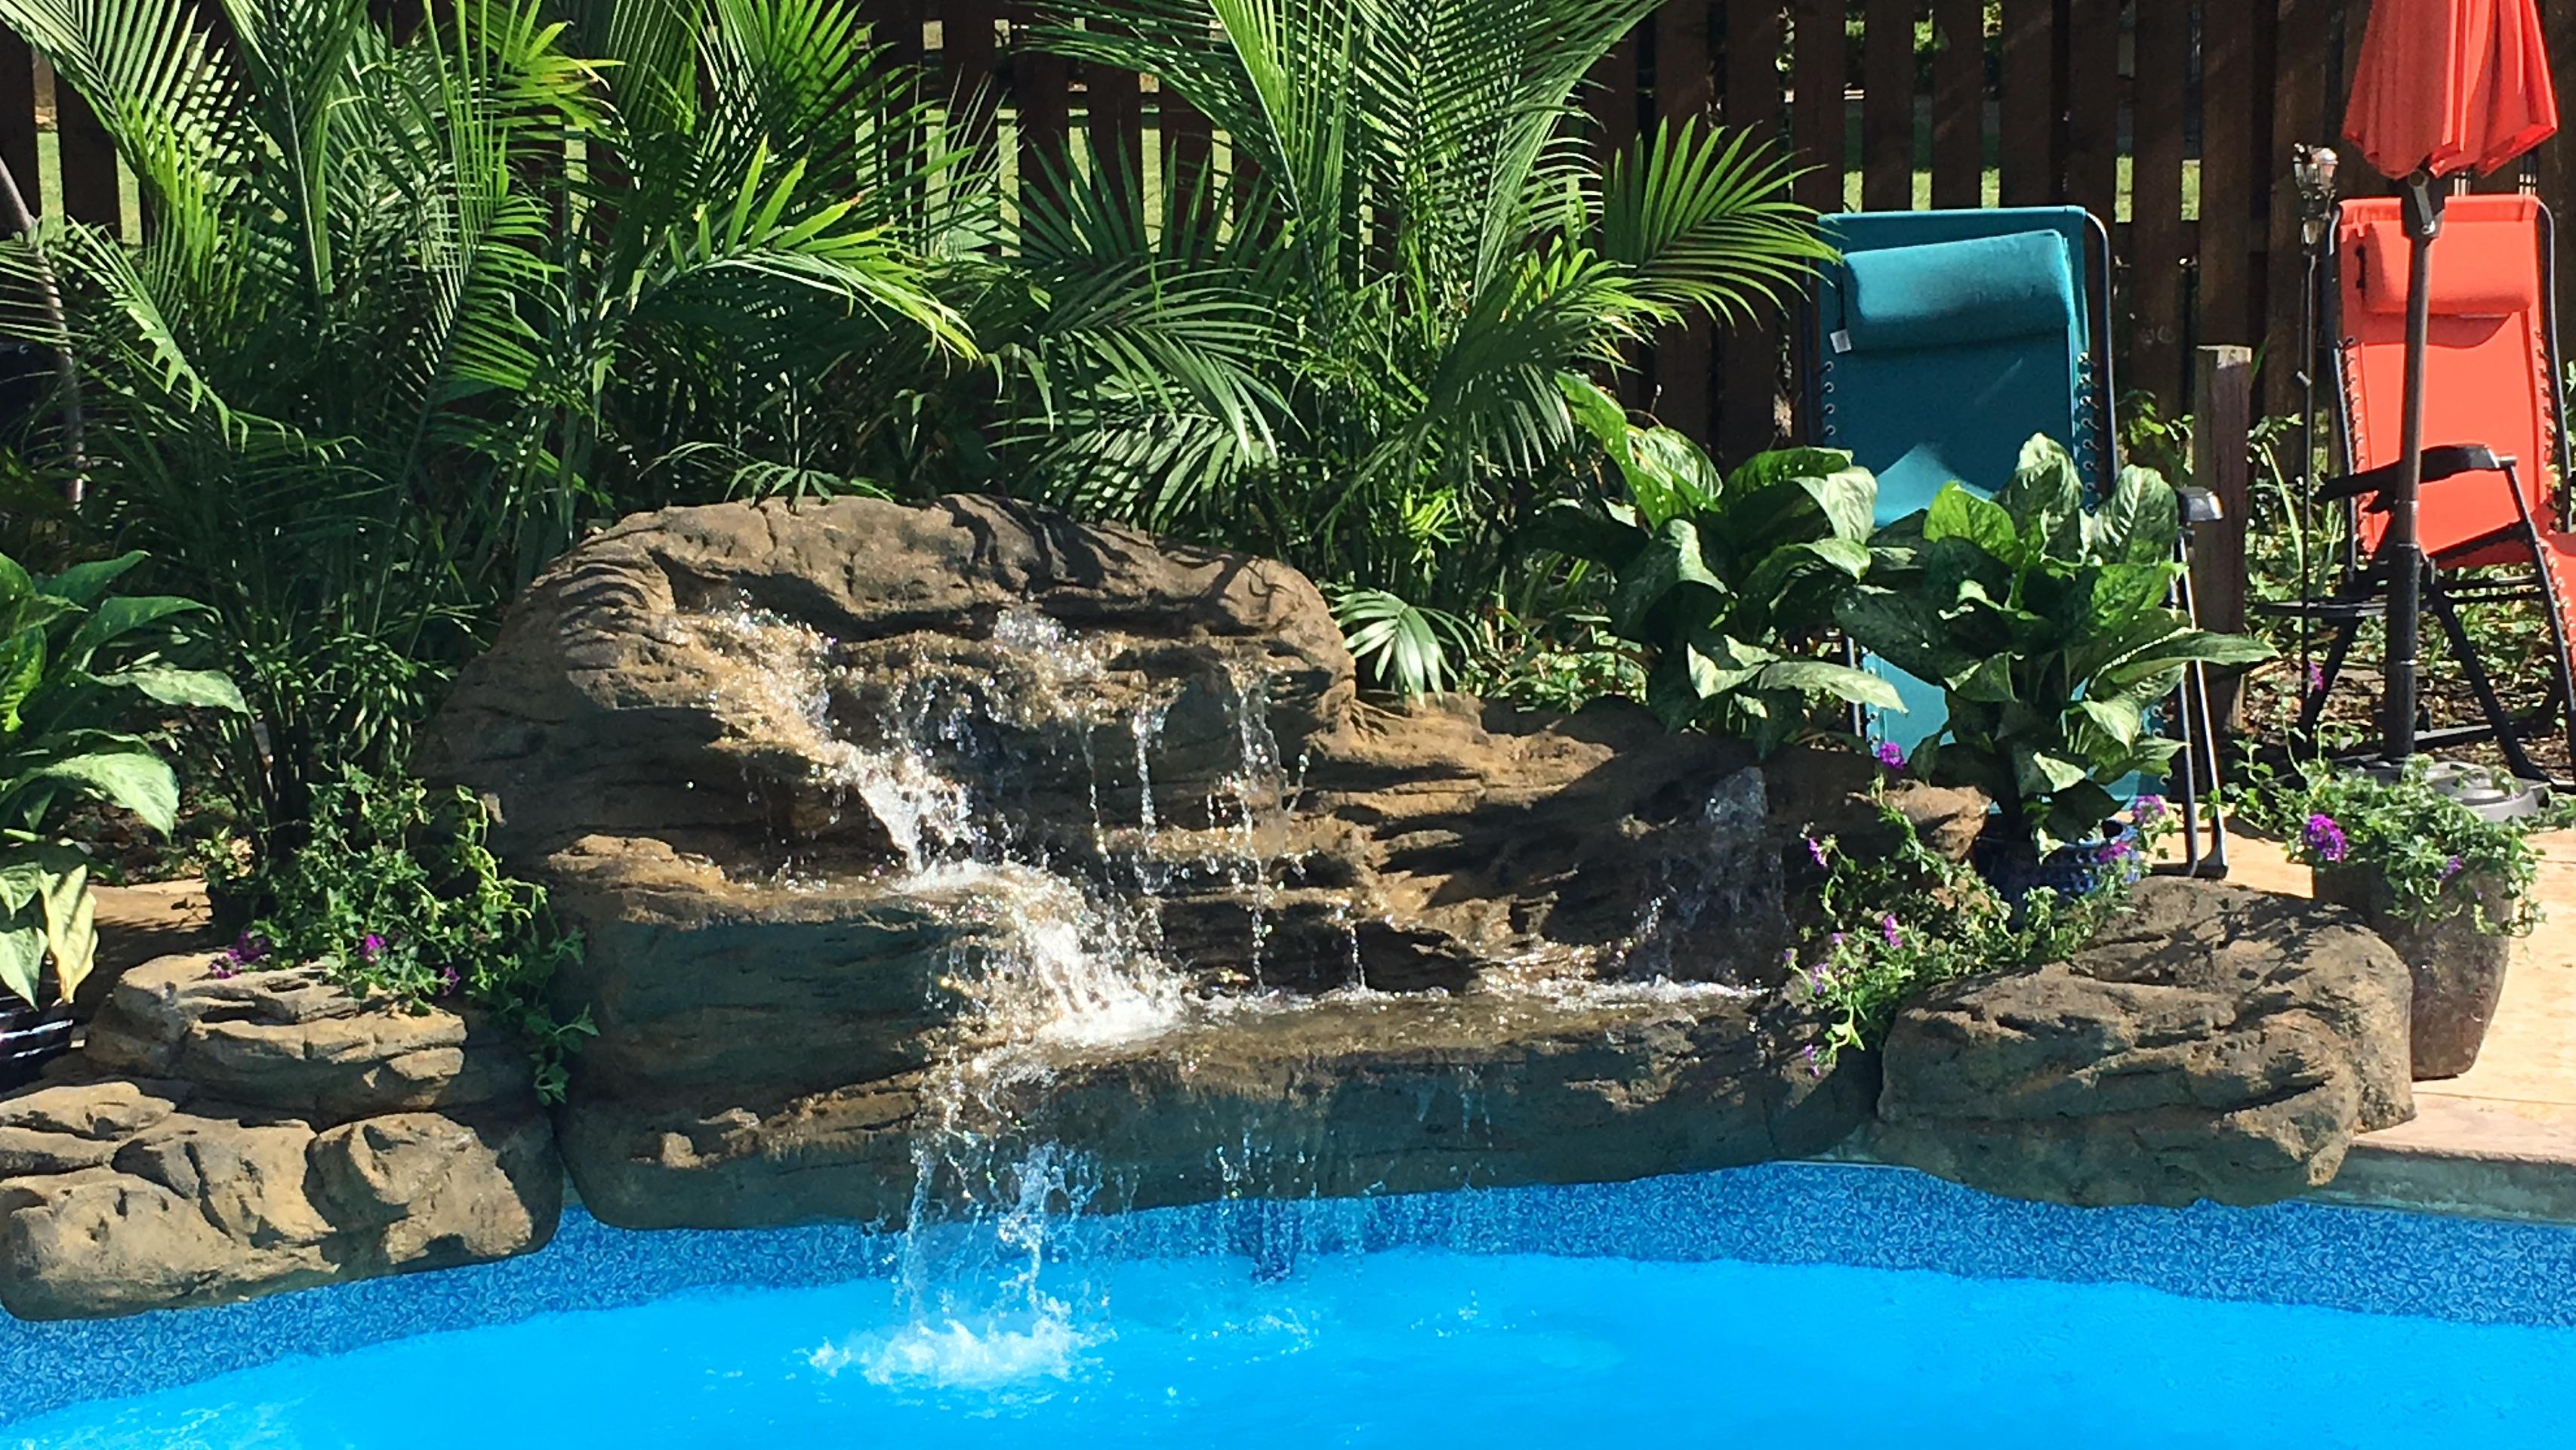 Tranquil Falls Swimming Pool Waterfall Kit- FREE SHIPPING!